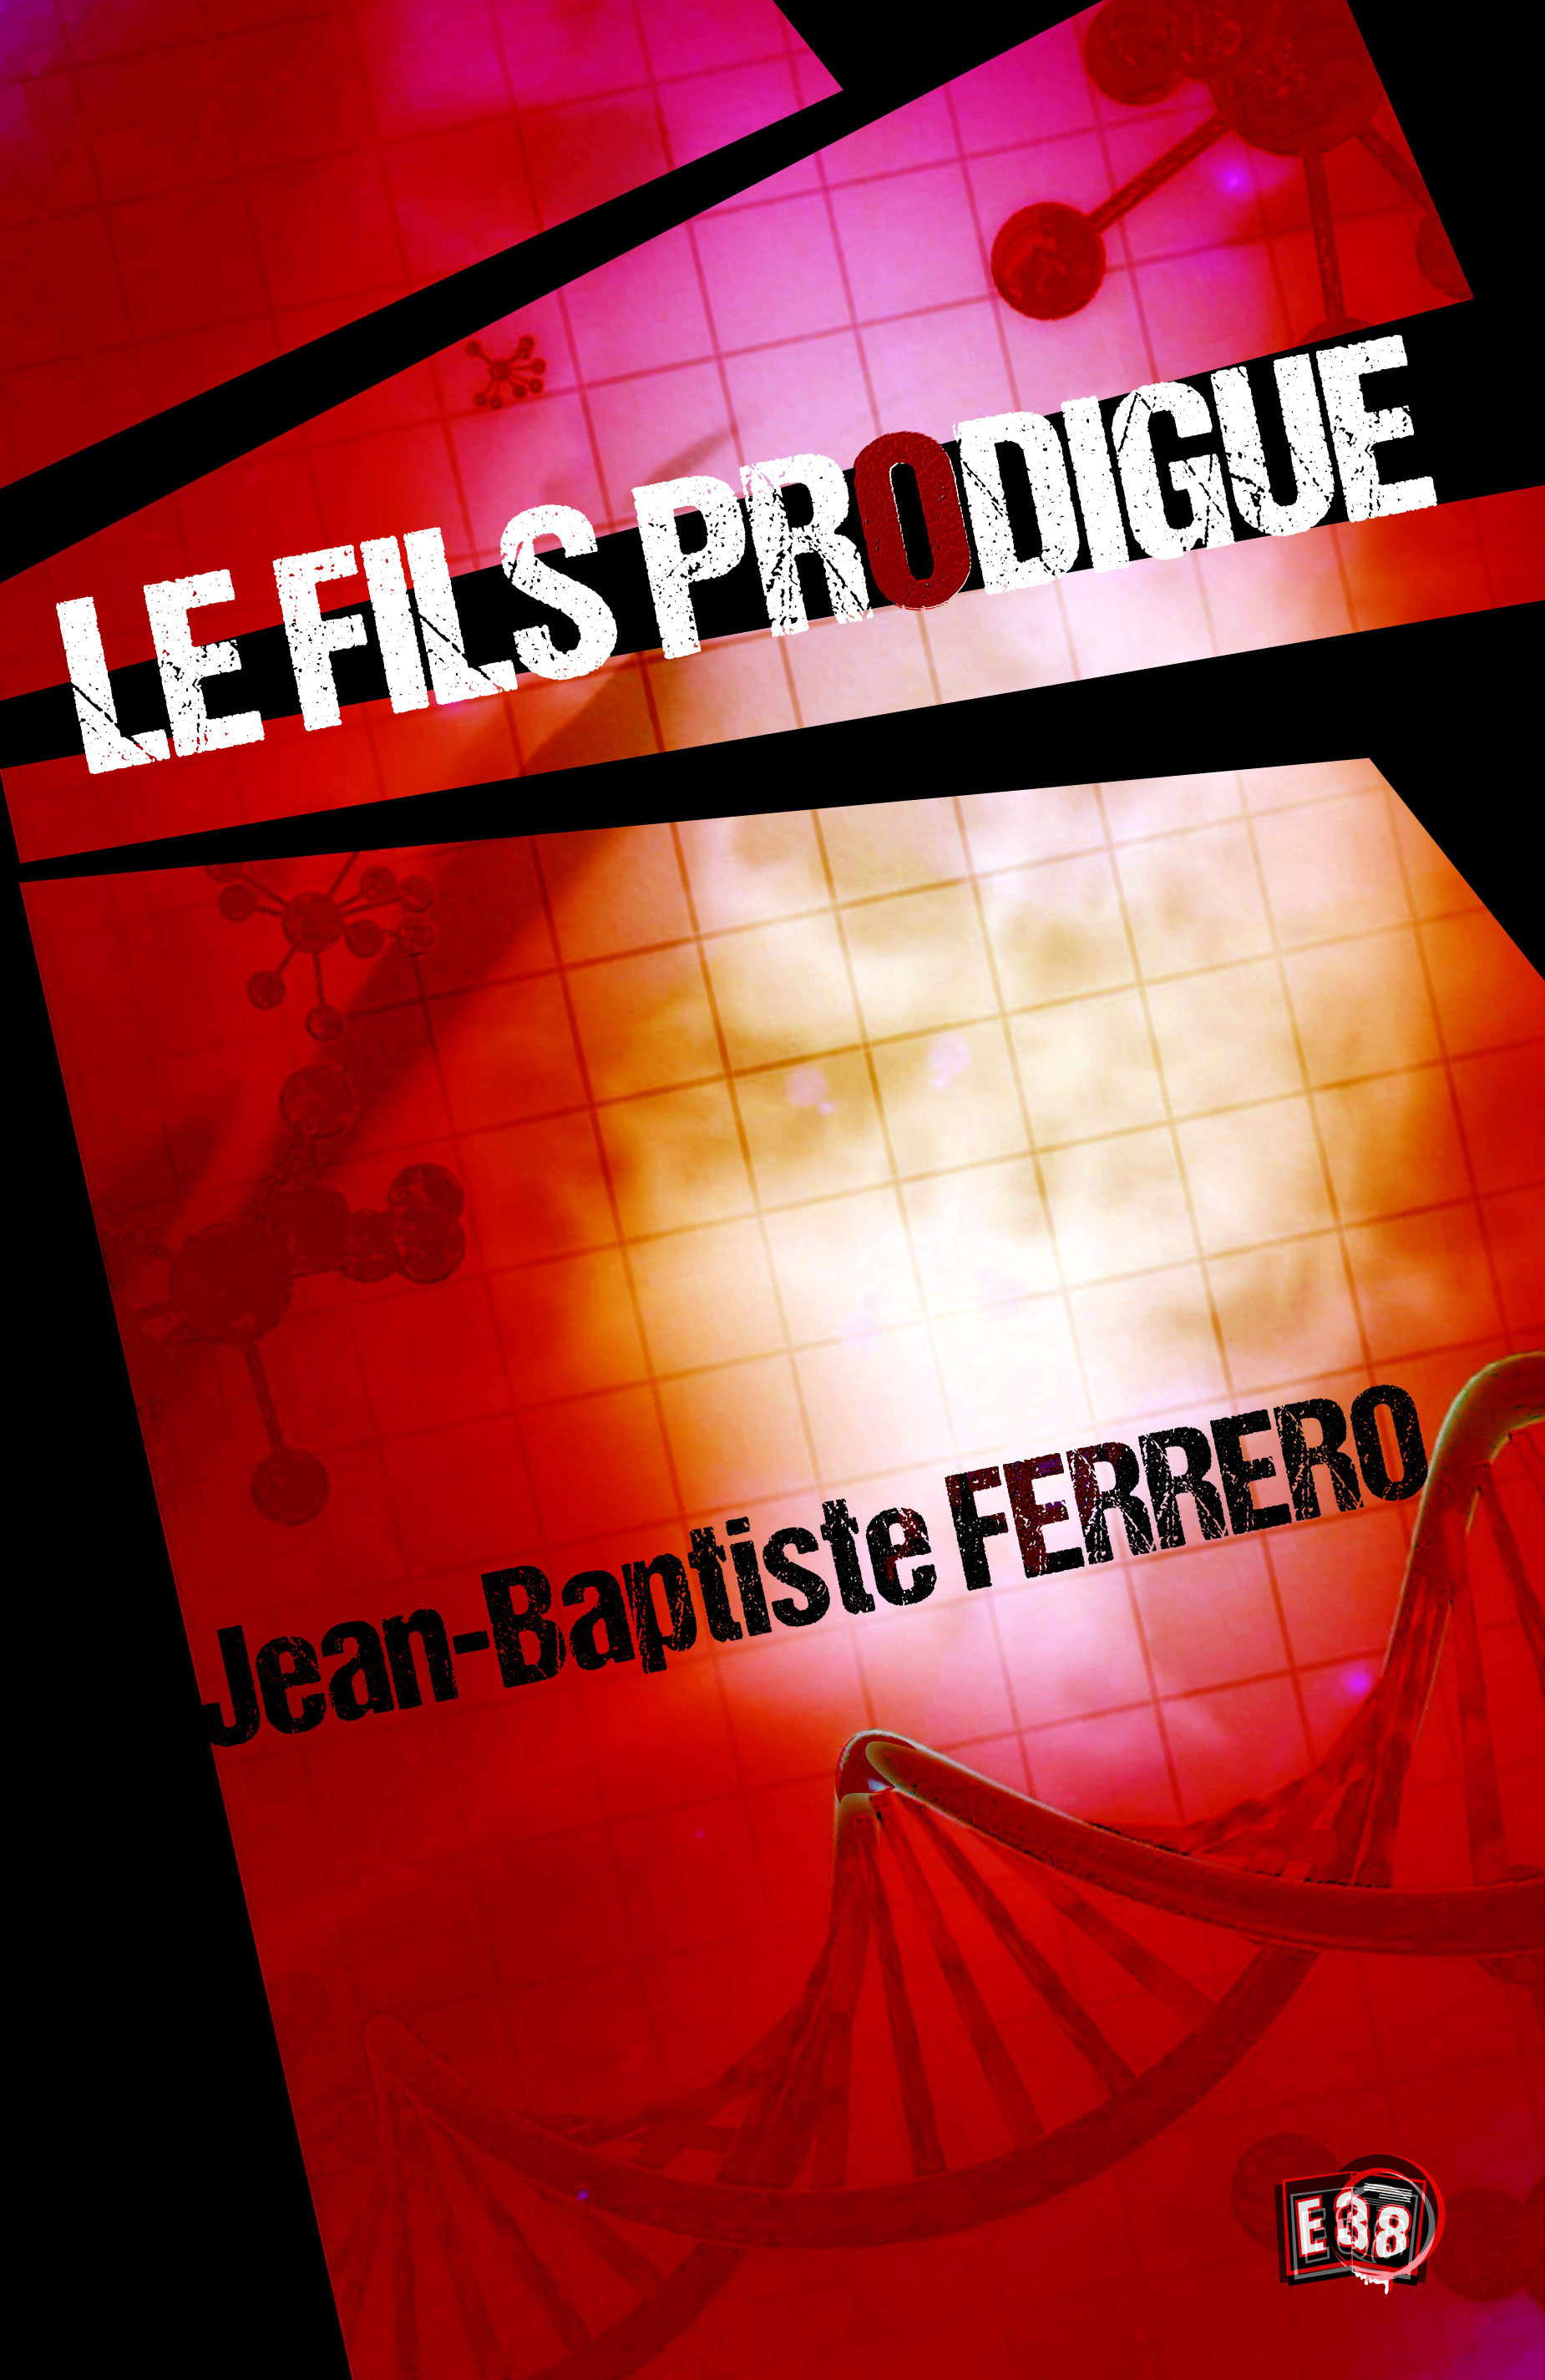 Jean-Baptiste Ferrero Le fils prodigue